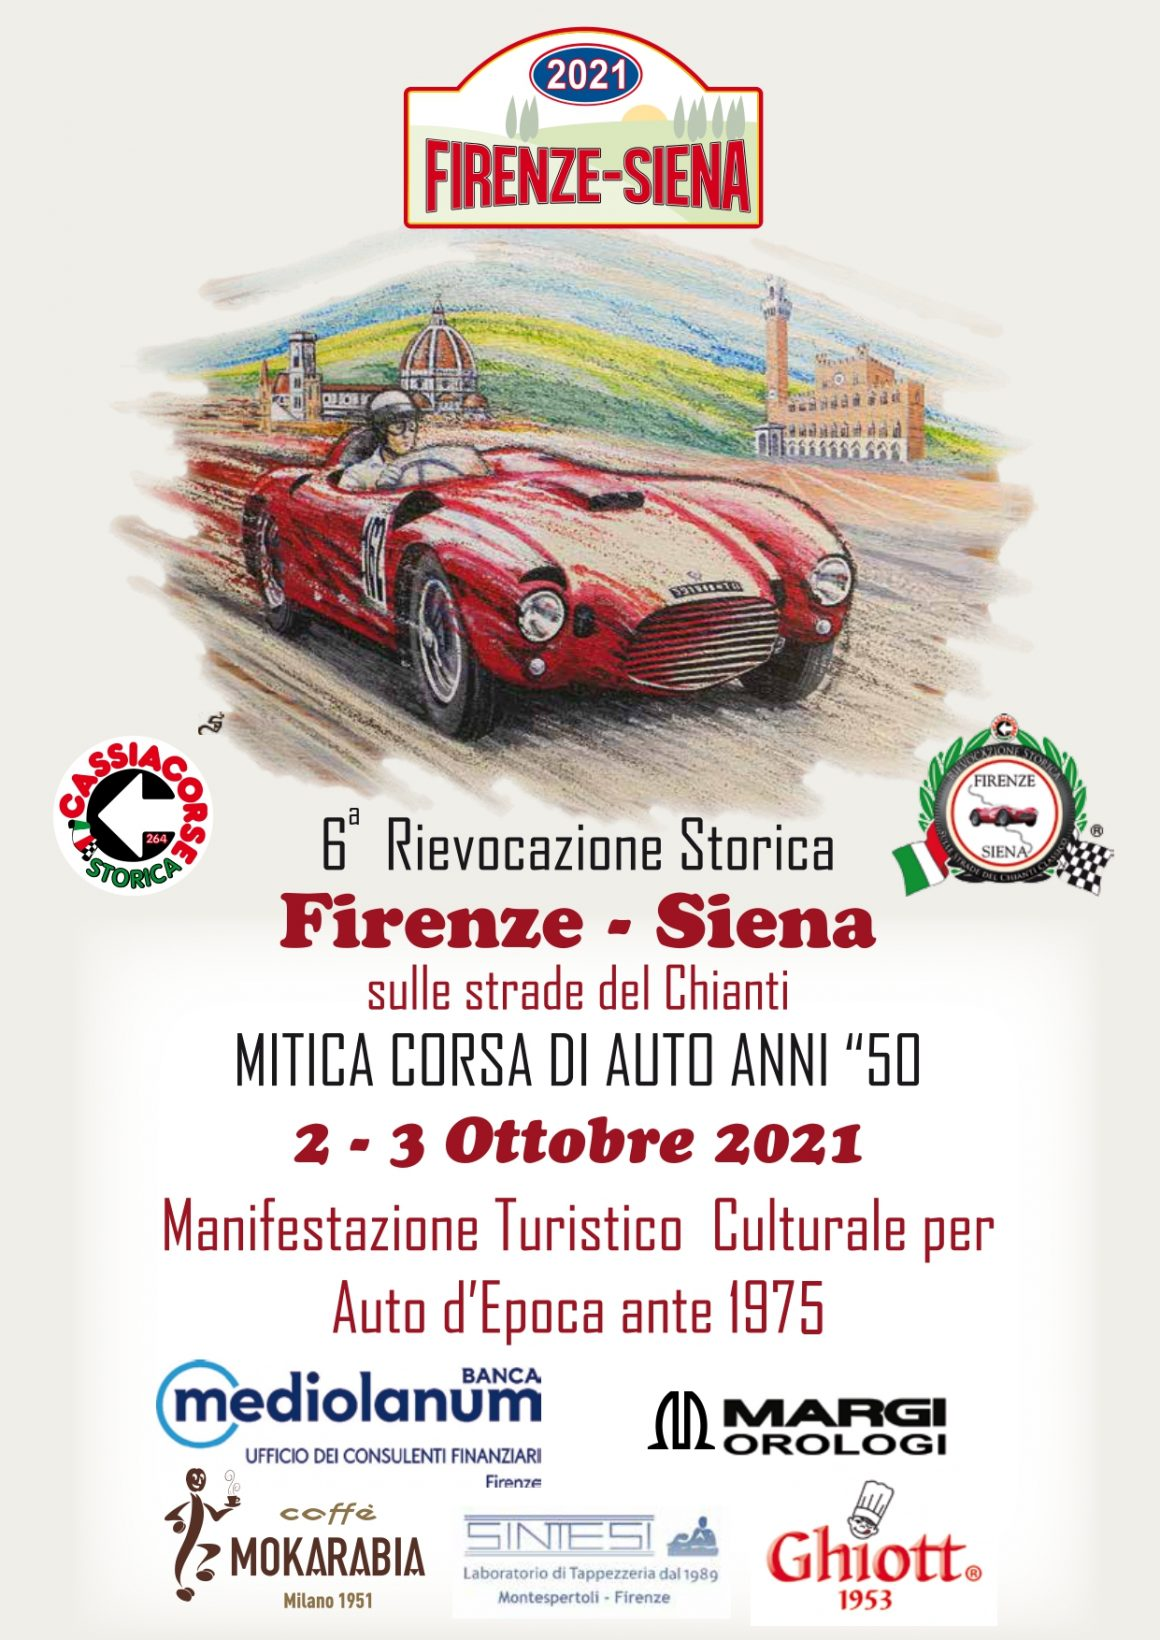 Locandina - Firenze-Siena 2019